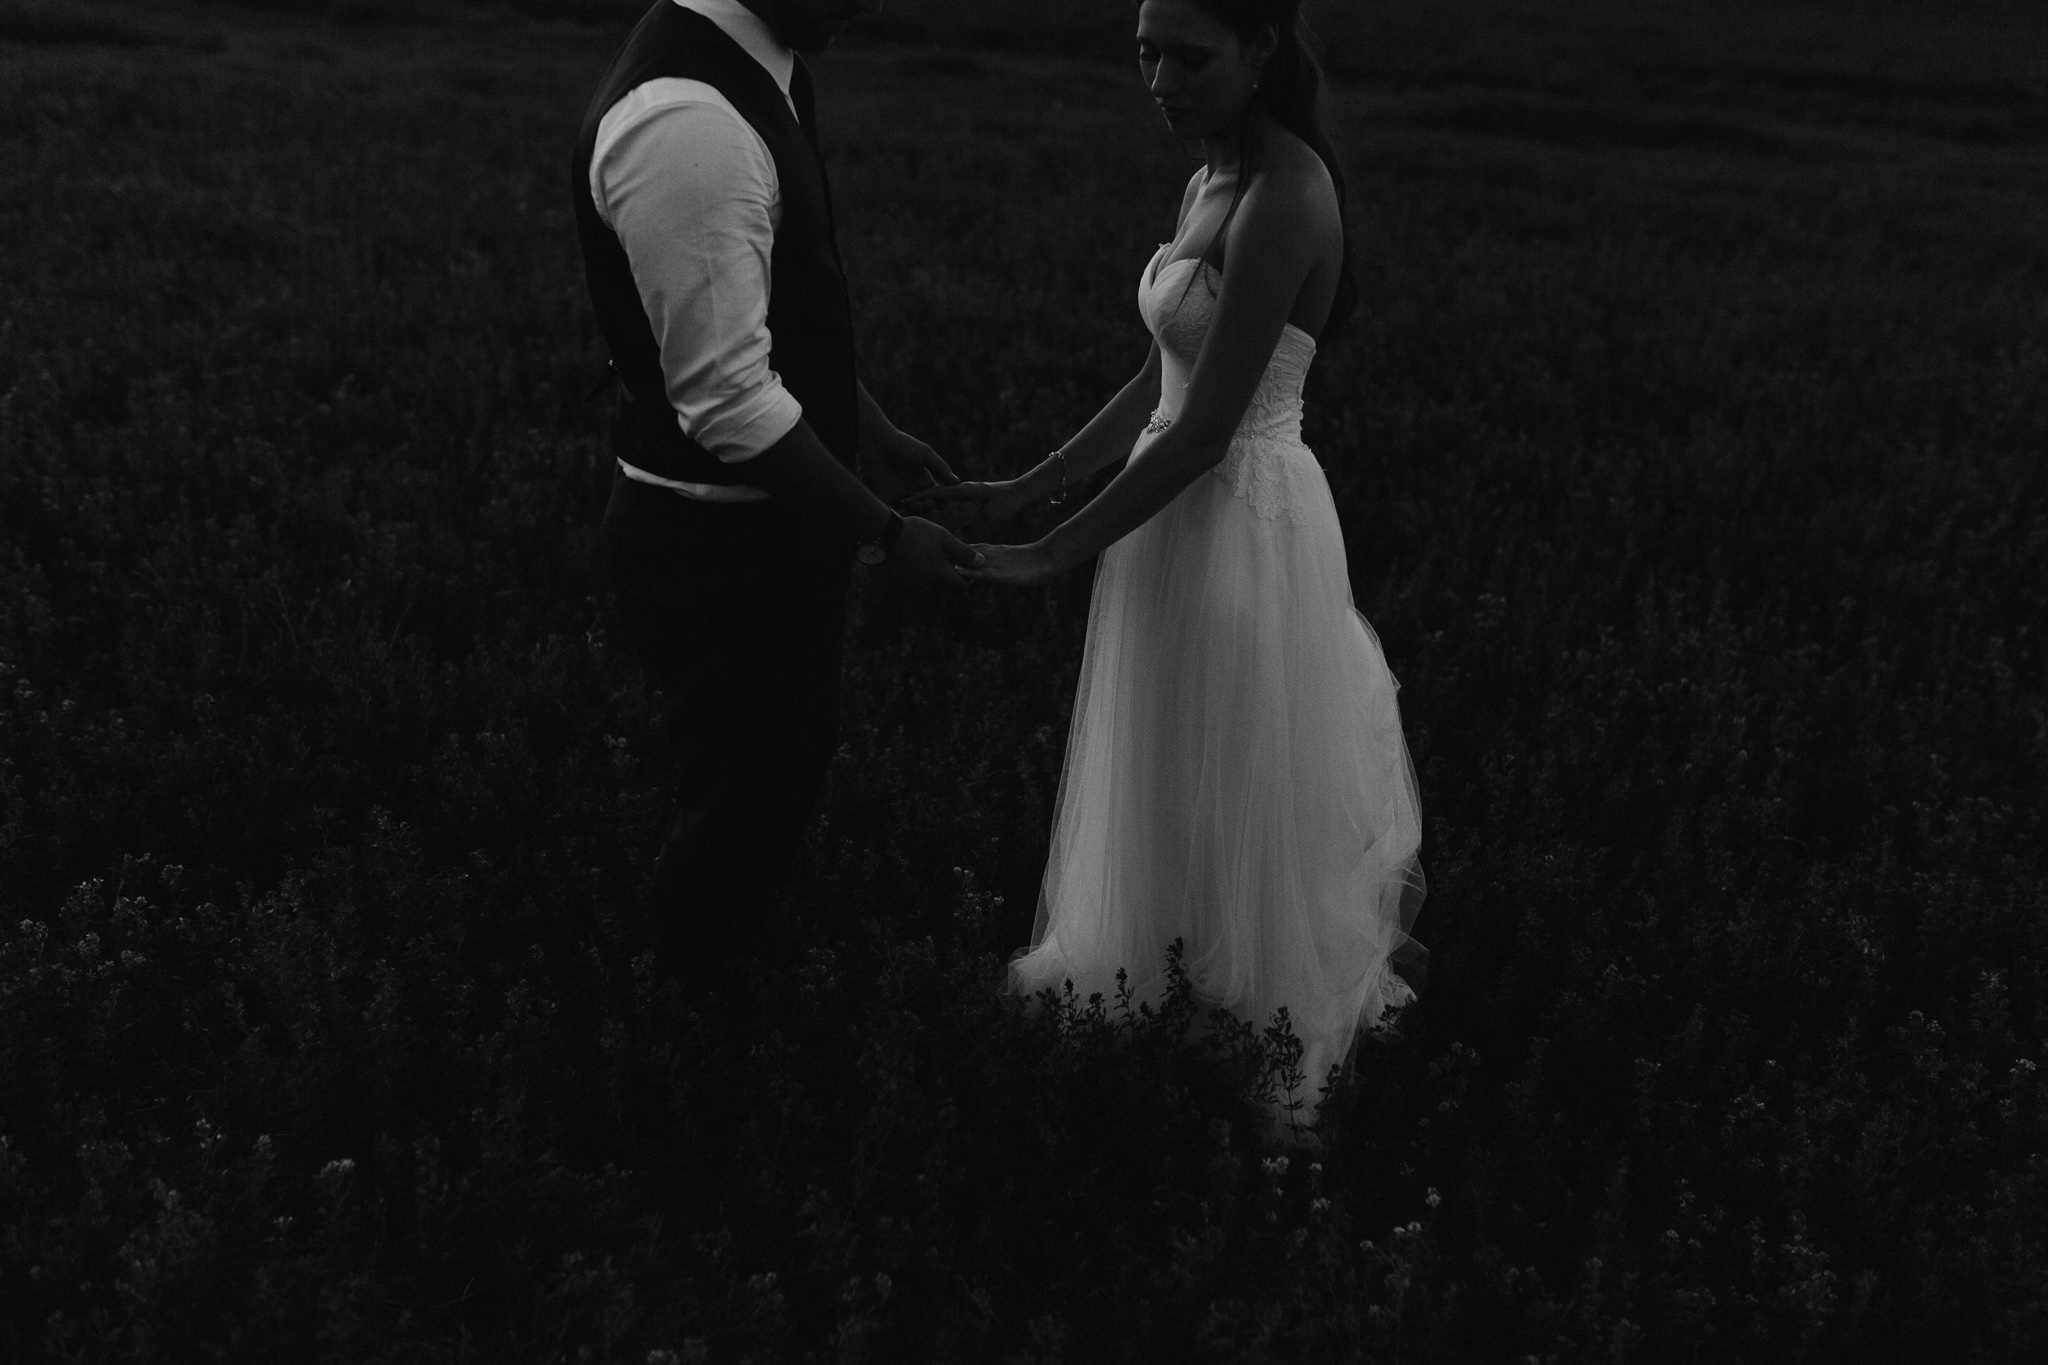 springer-house-burlington-wedding-photographer-635-of-756.jpg